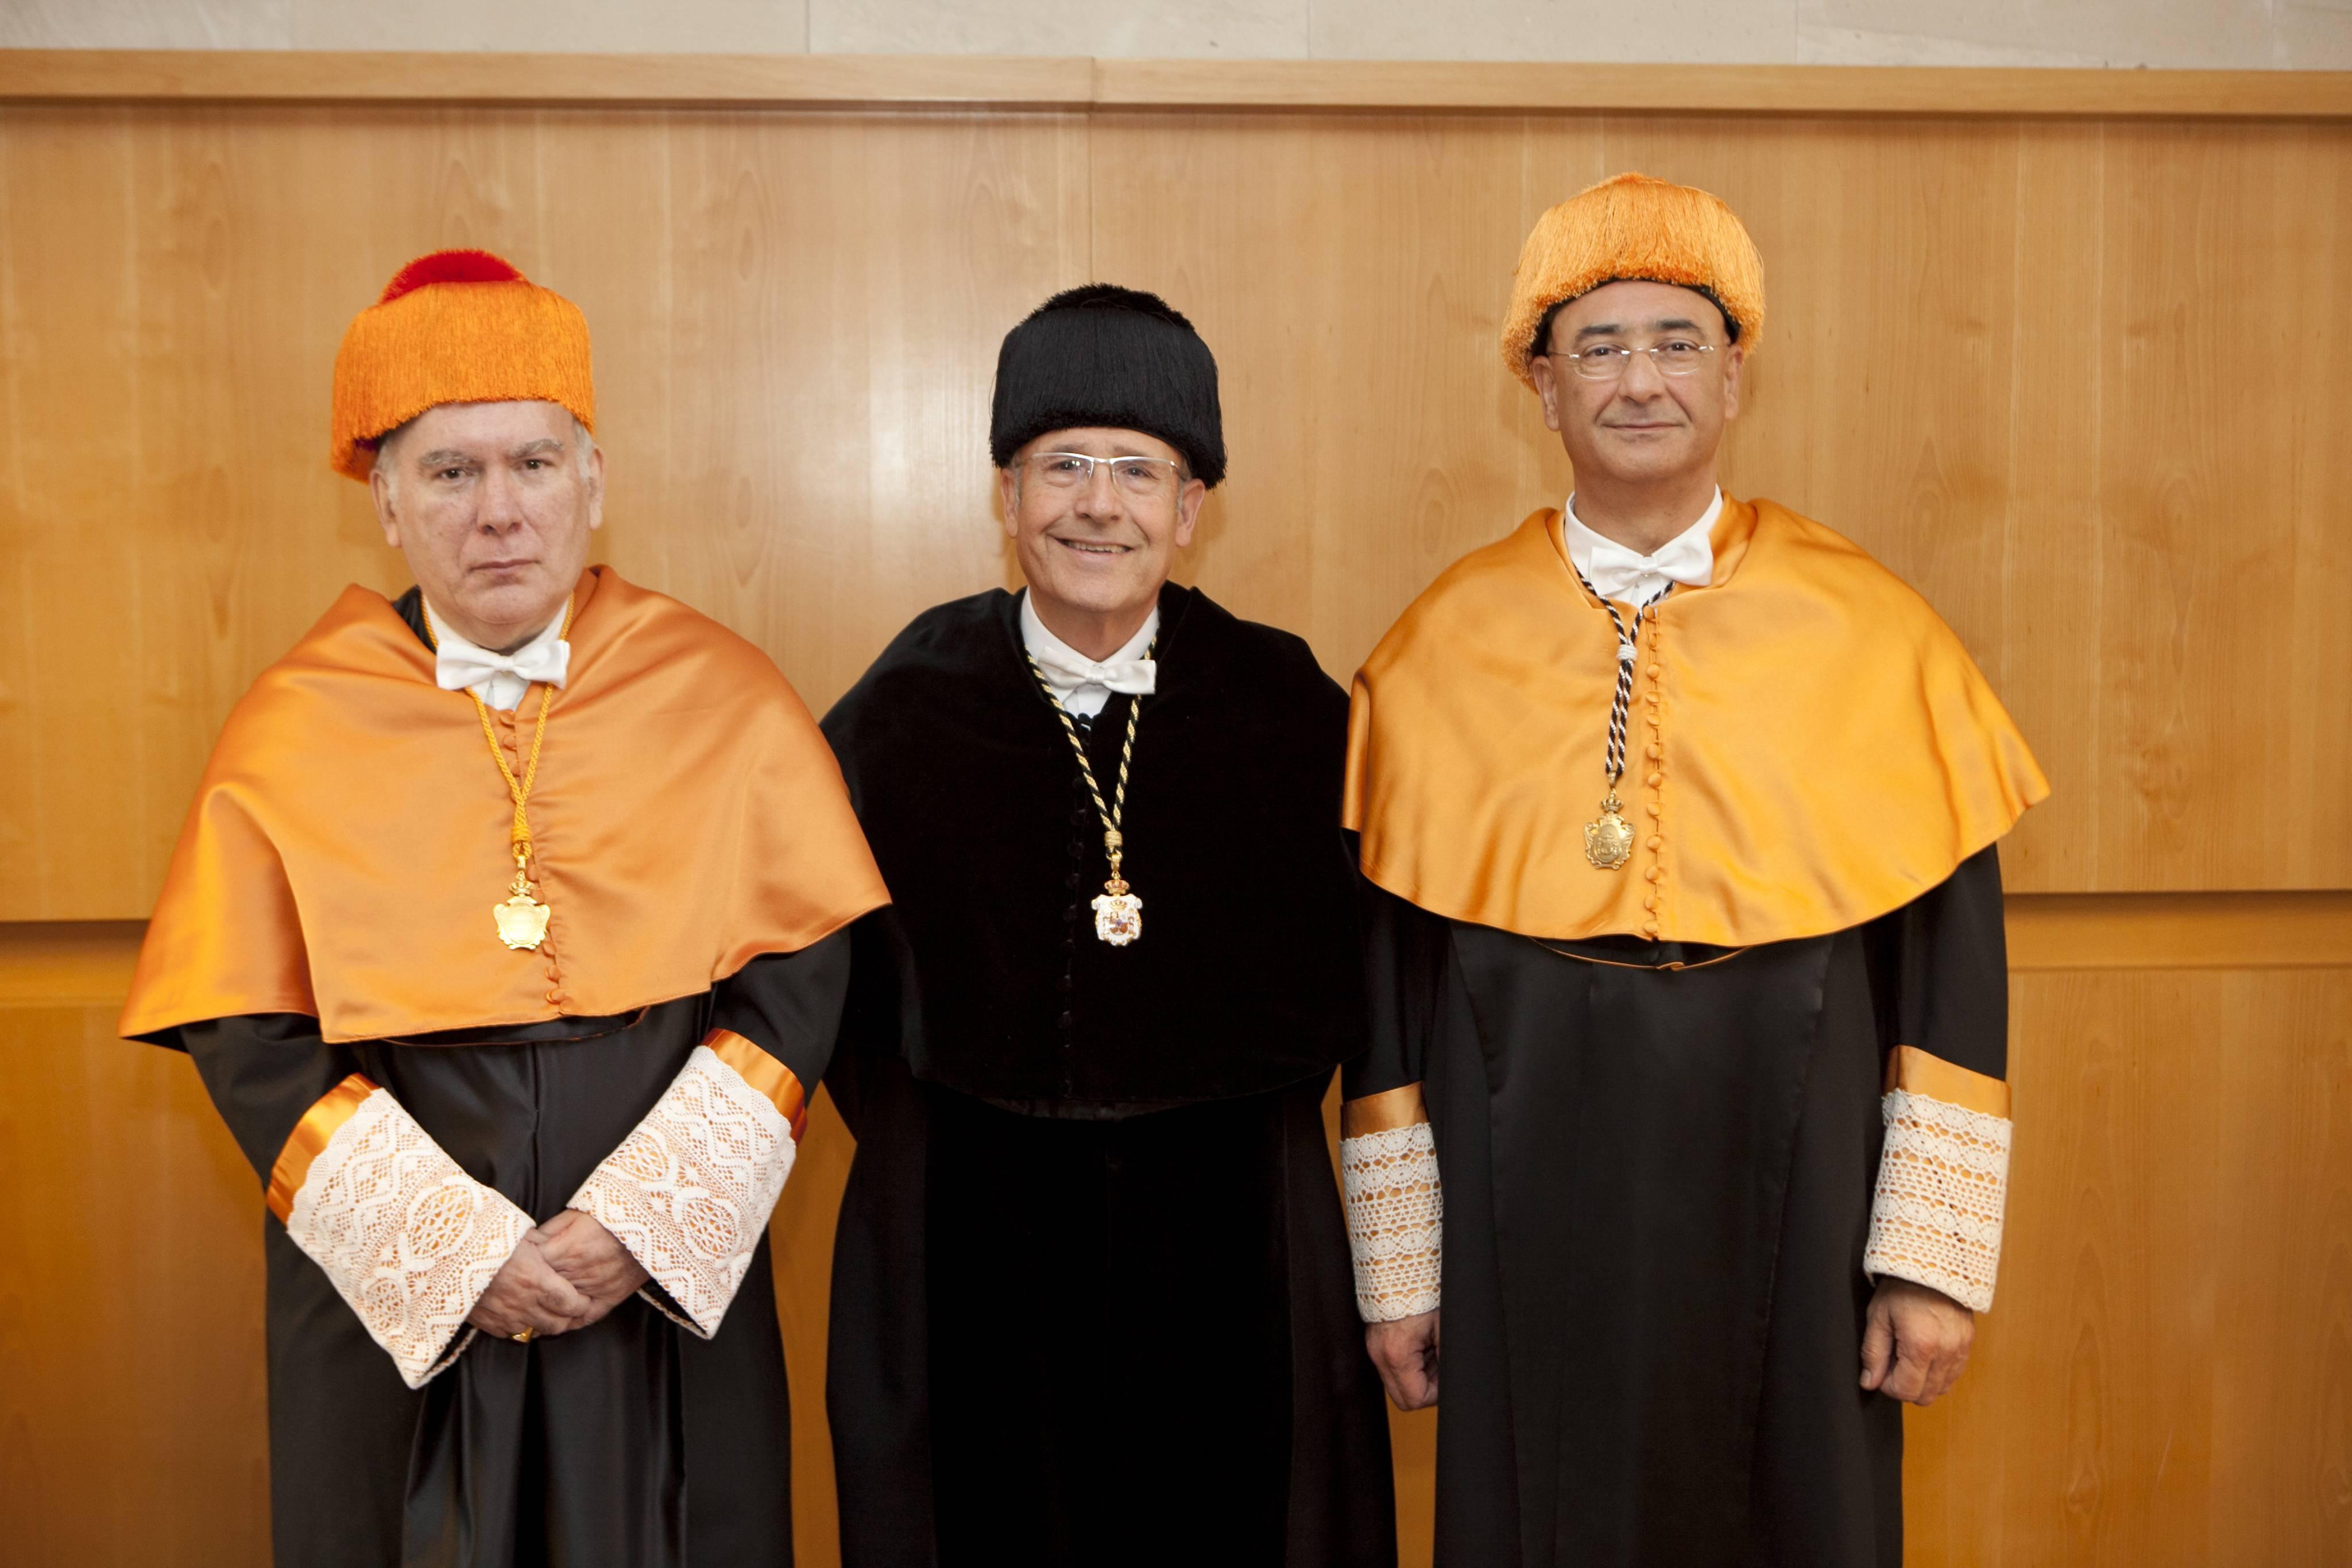 doctor-honoris-causa-luis-gamir_mg_1286.jpg